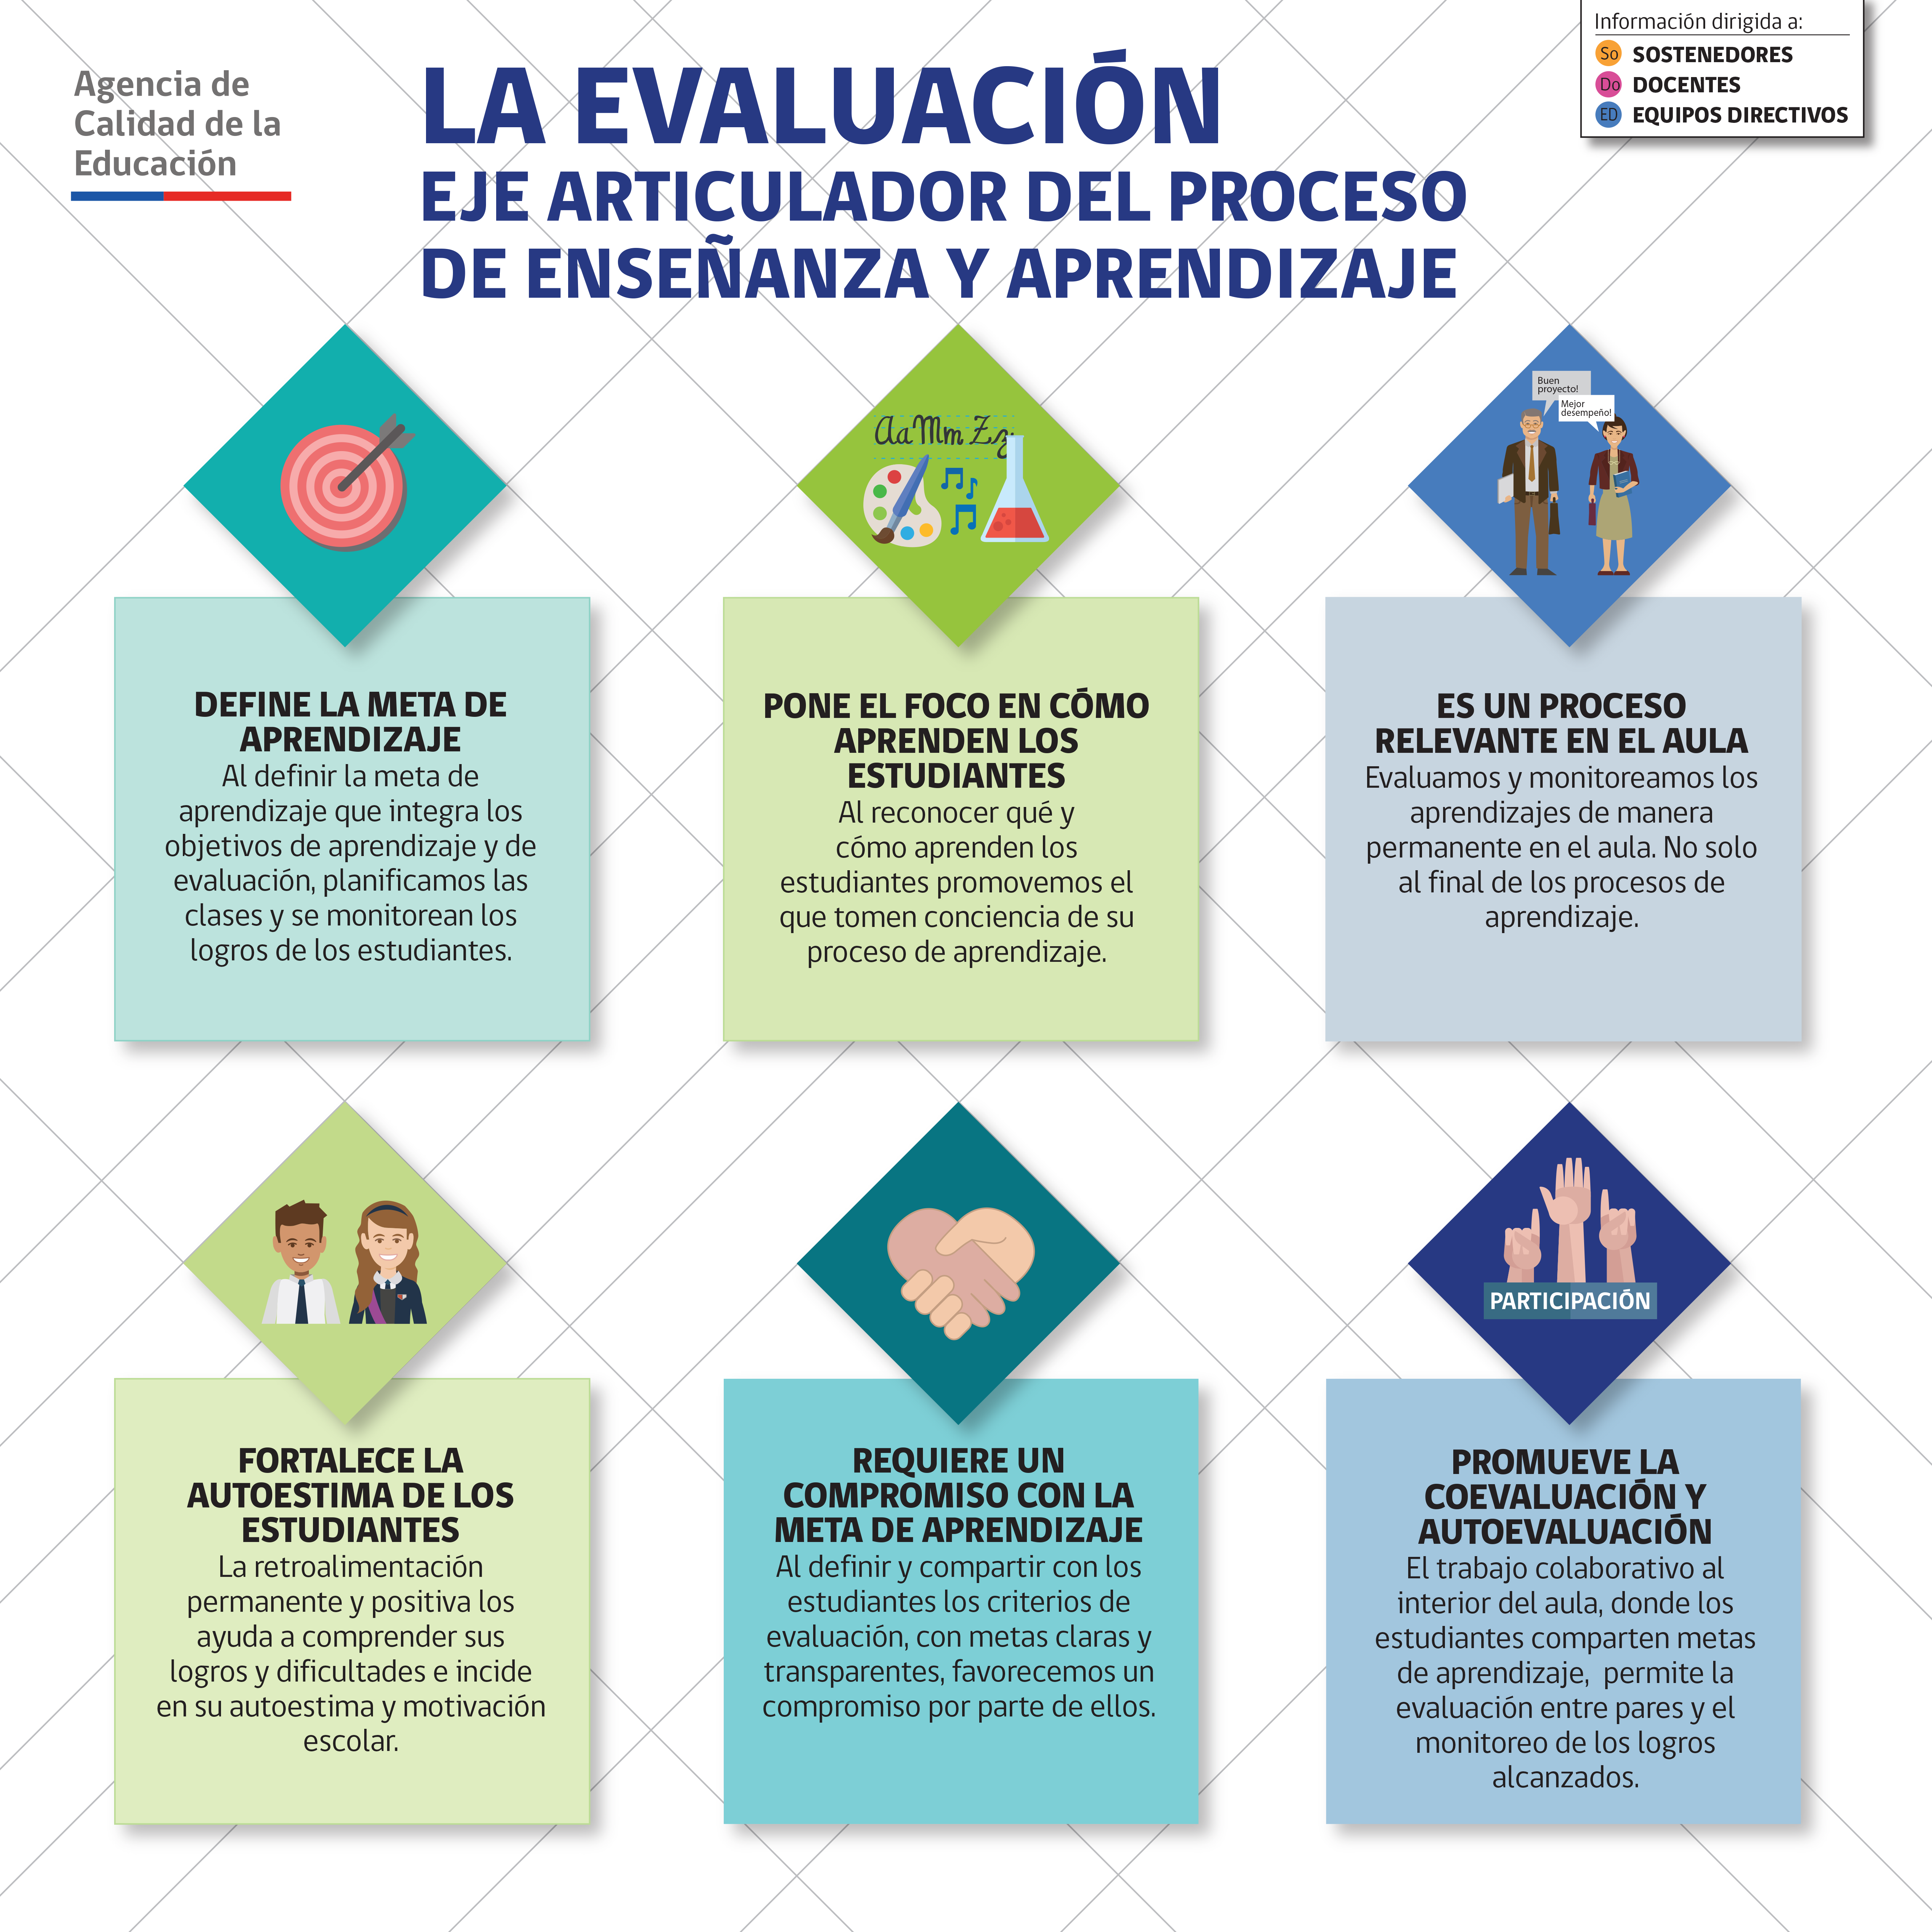 a356e5fa9 Infografías - Agencia de Calidad de la Educación